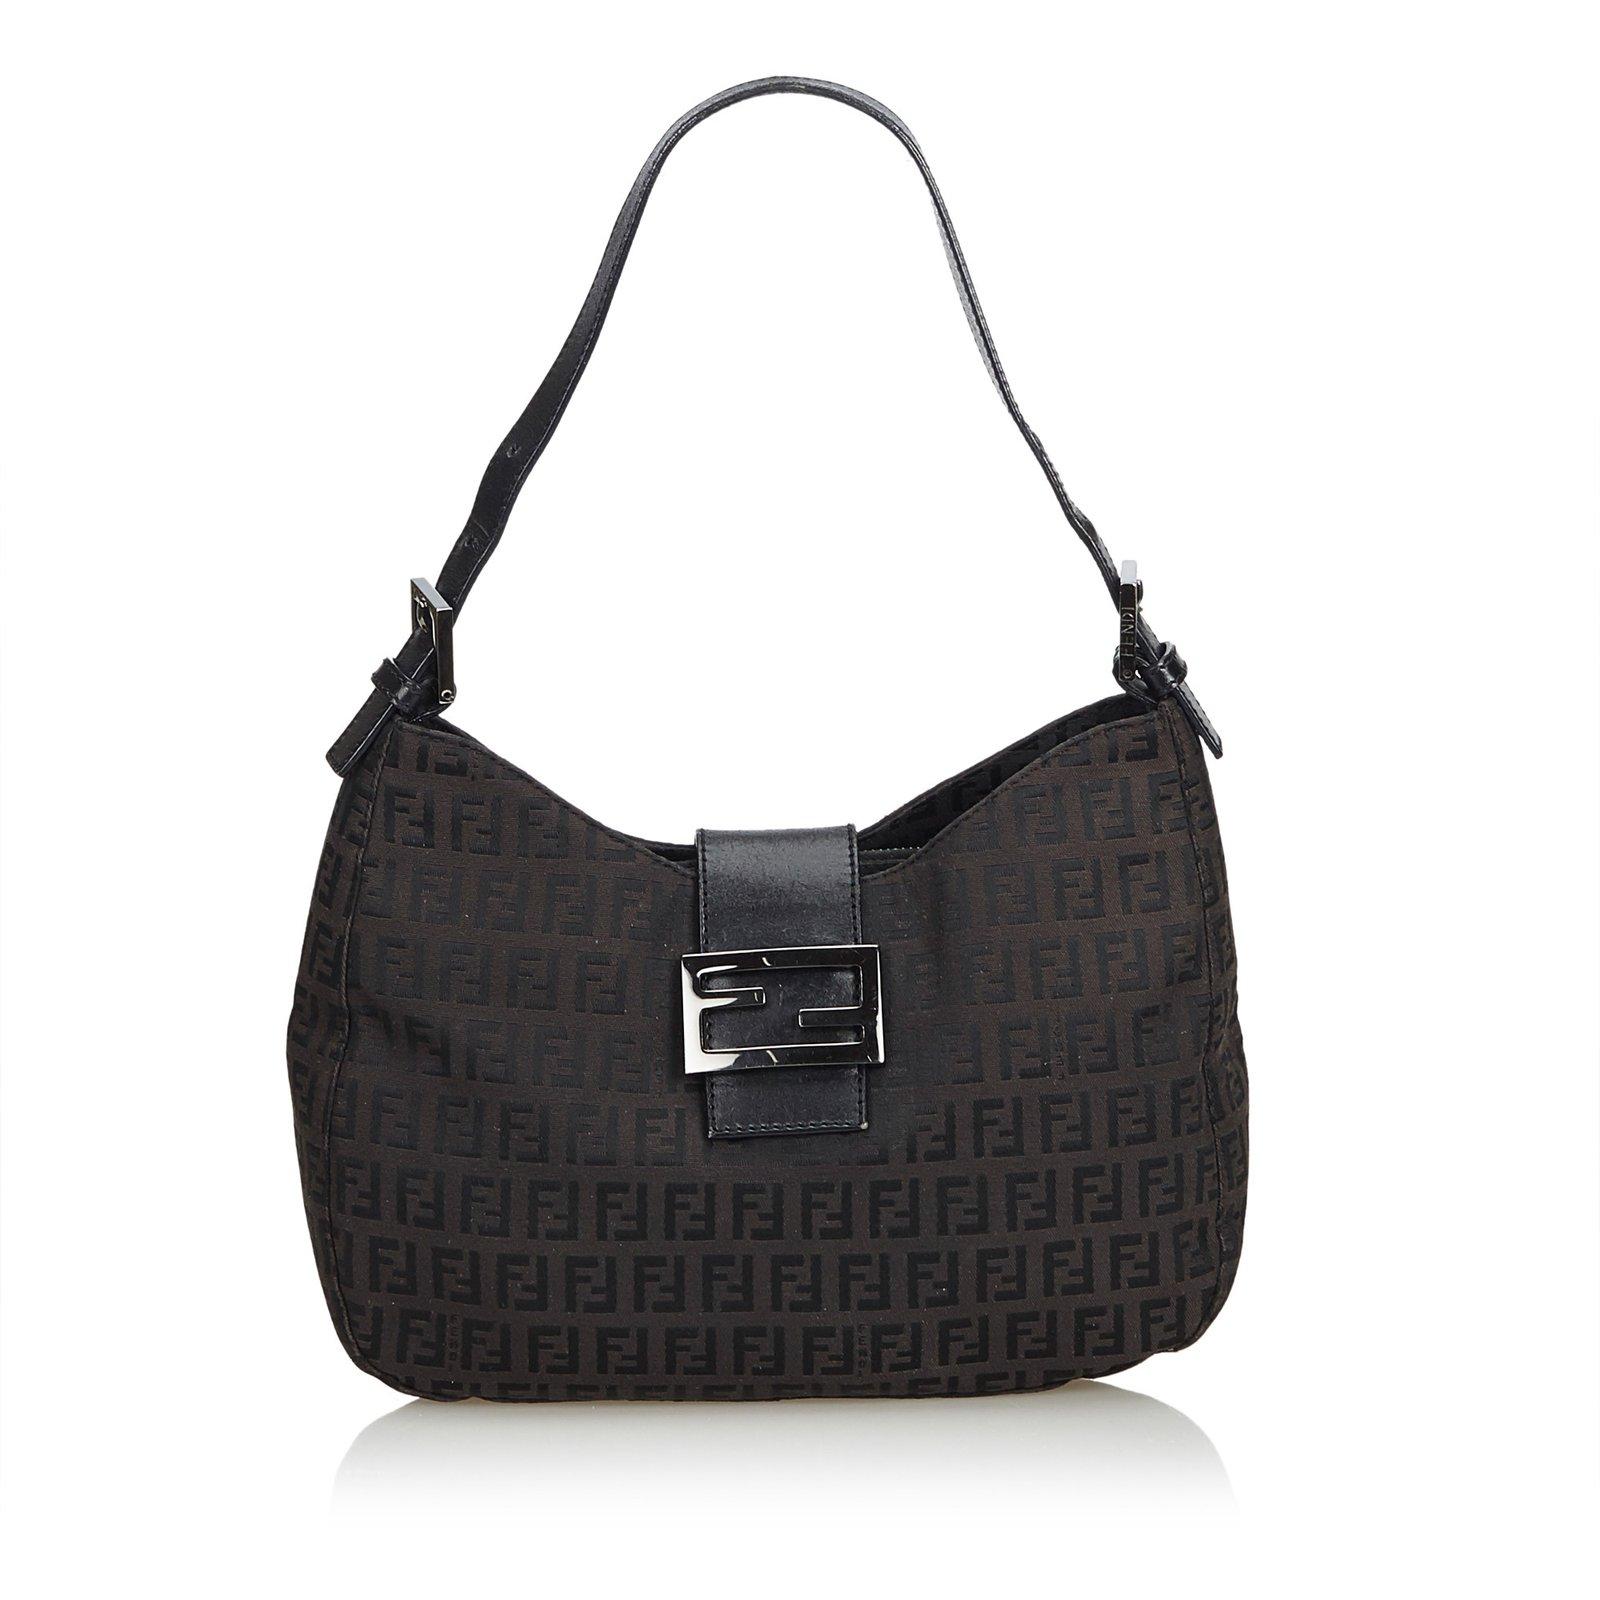 e29f31d833 Zucca Jacquard Mamma Forever Shoulder Bag